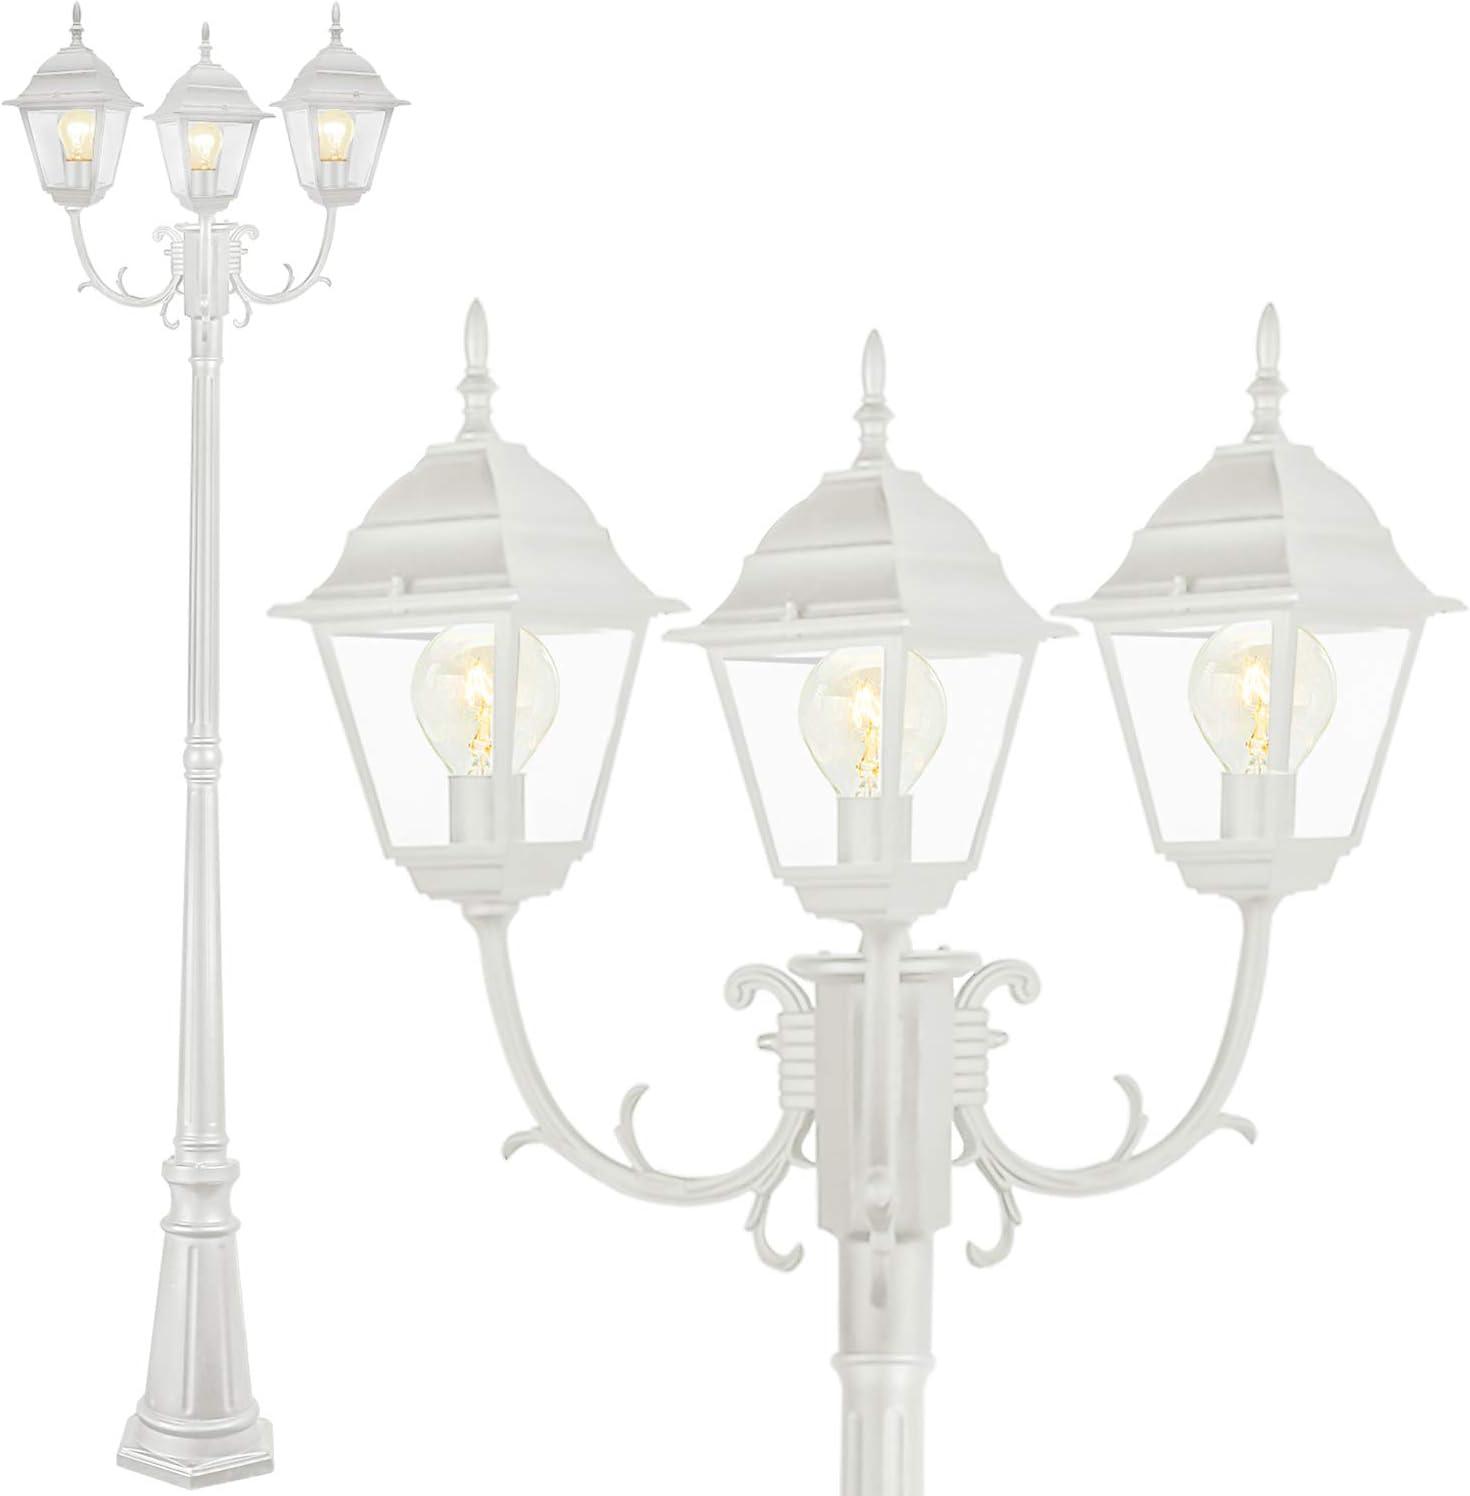 CINOTON Outdoor Lamp Post Waterproof Max 78% OFF Ranking TOP6 Light Street